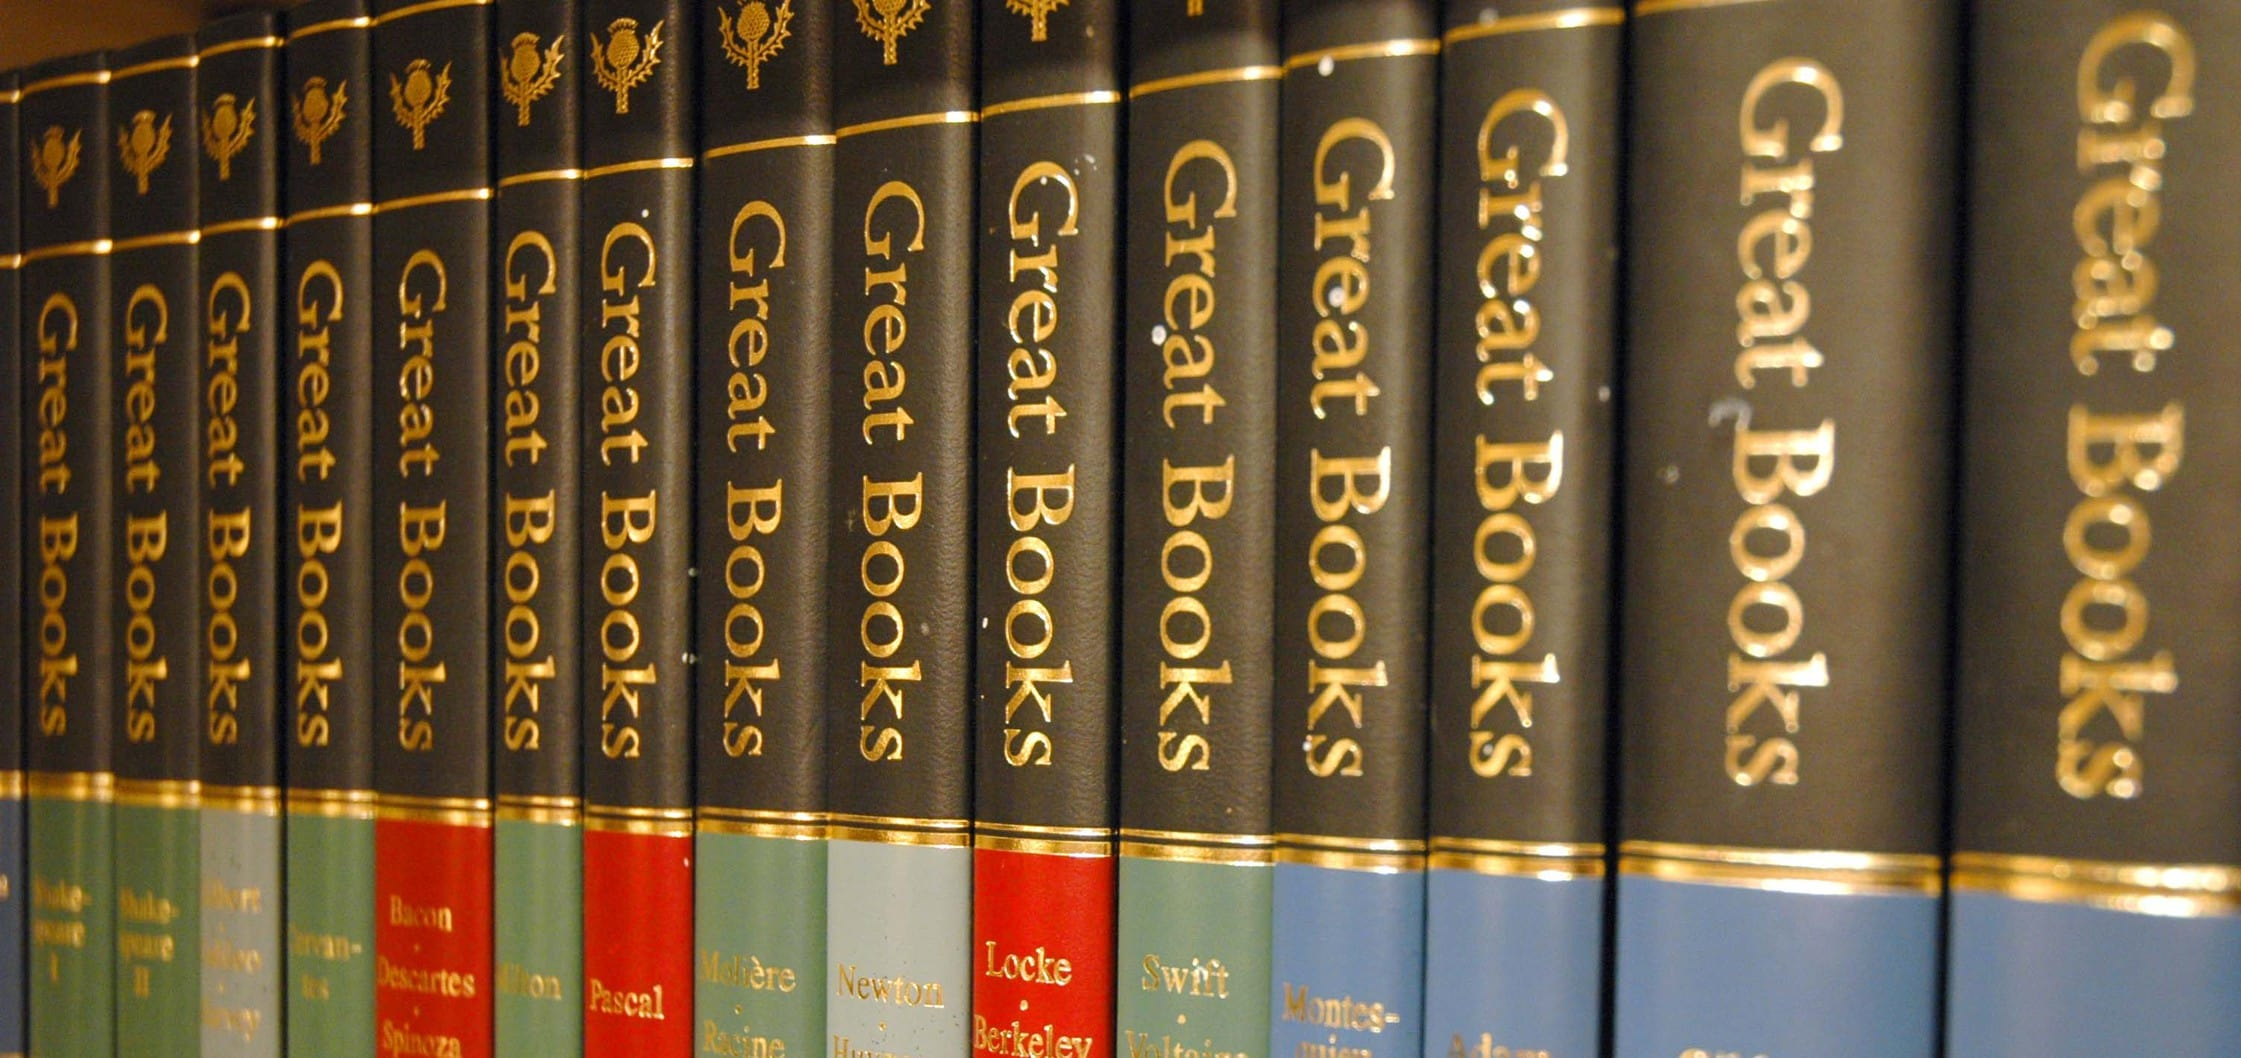 Choosing Good Books